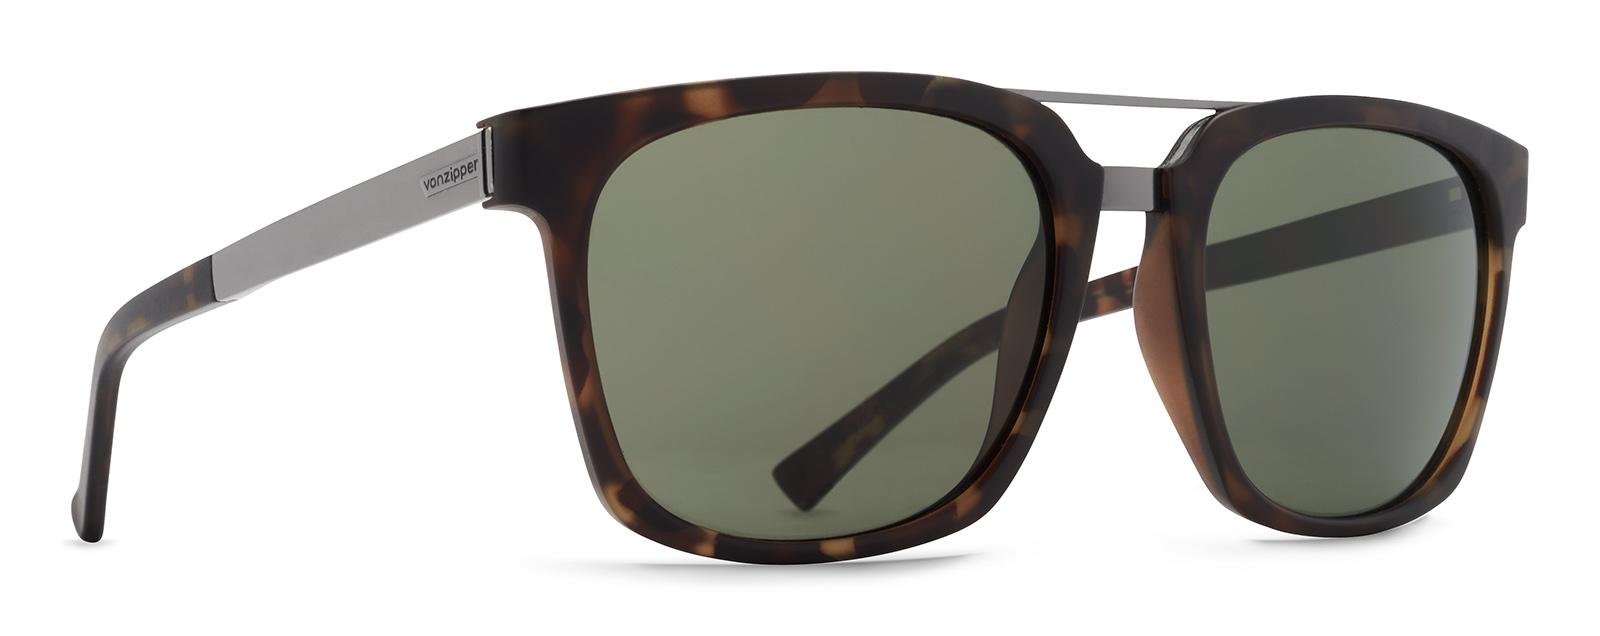 c3317a1d14 VonZipper Sunglasses SS18 Preview - Boardsport SOURCE